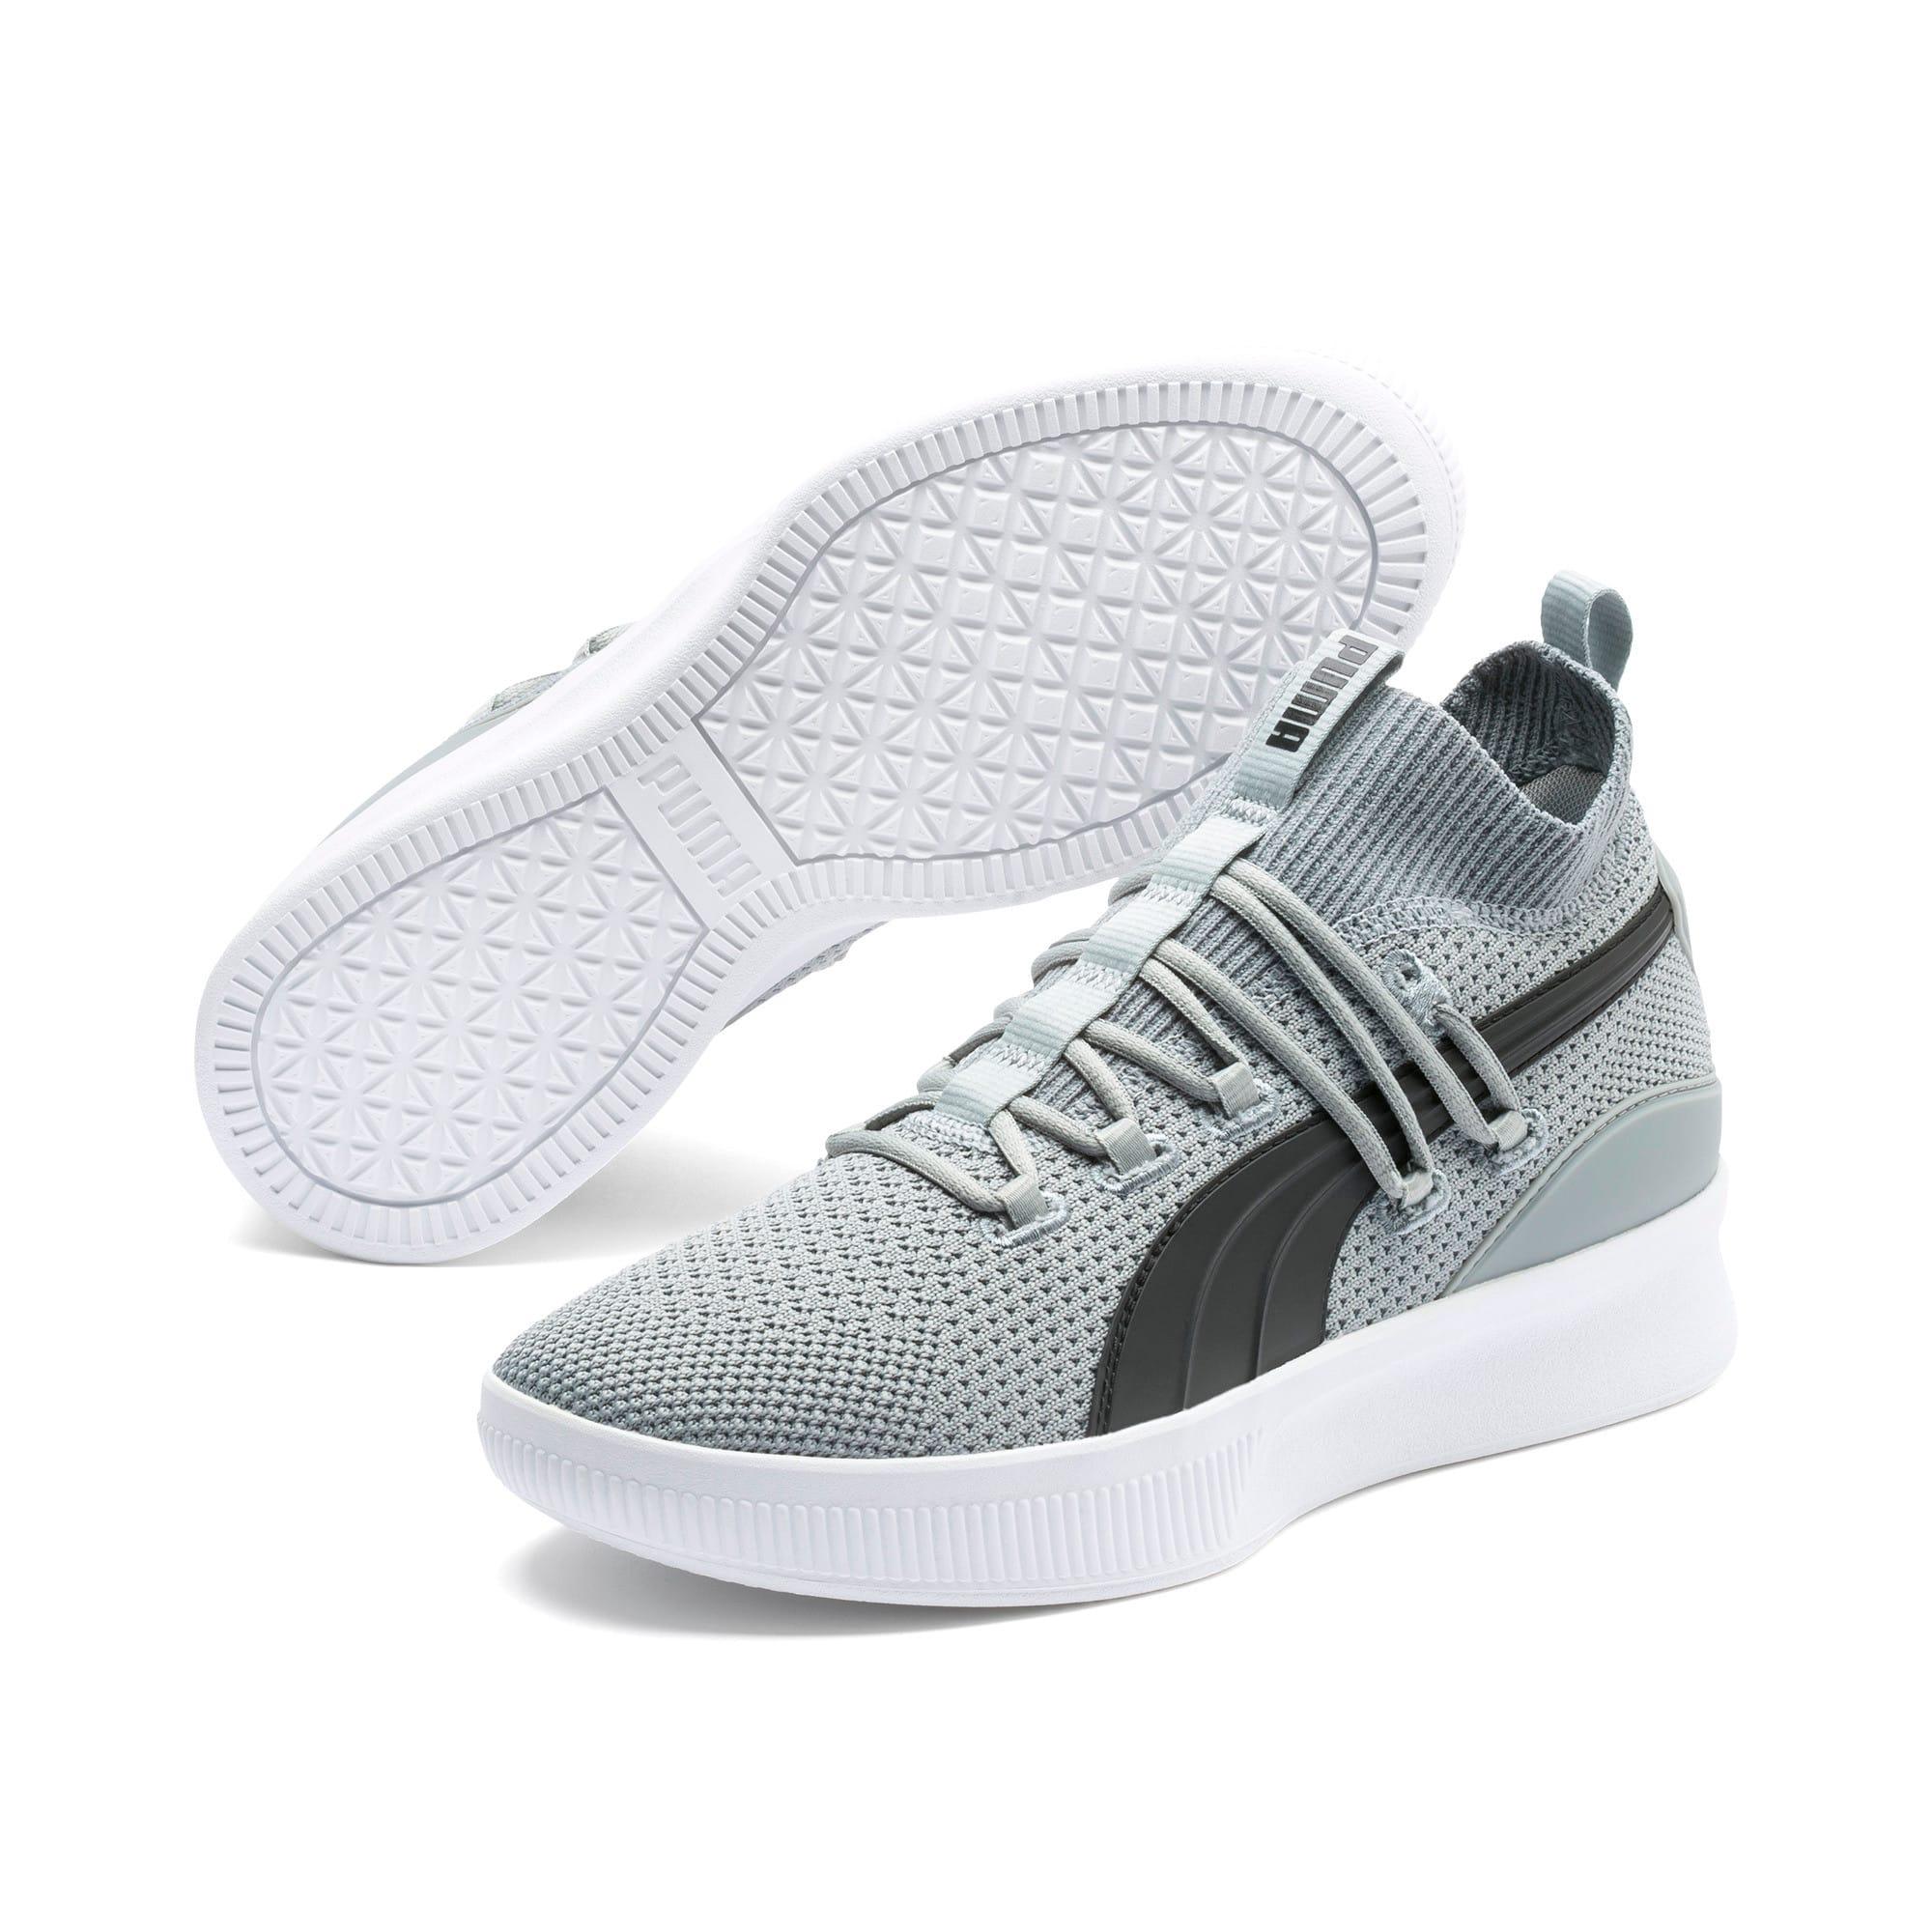 Thumbnail 2 of Clyde Court Core Basketball Shoes, Quarry-Puma Black, medium